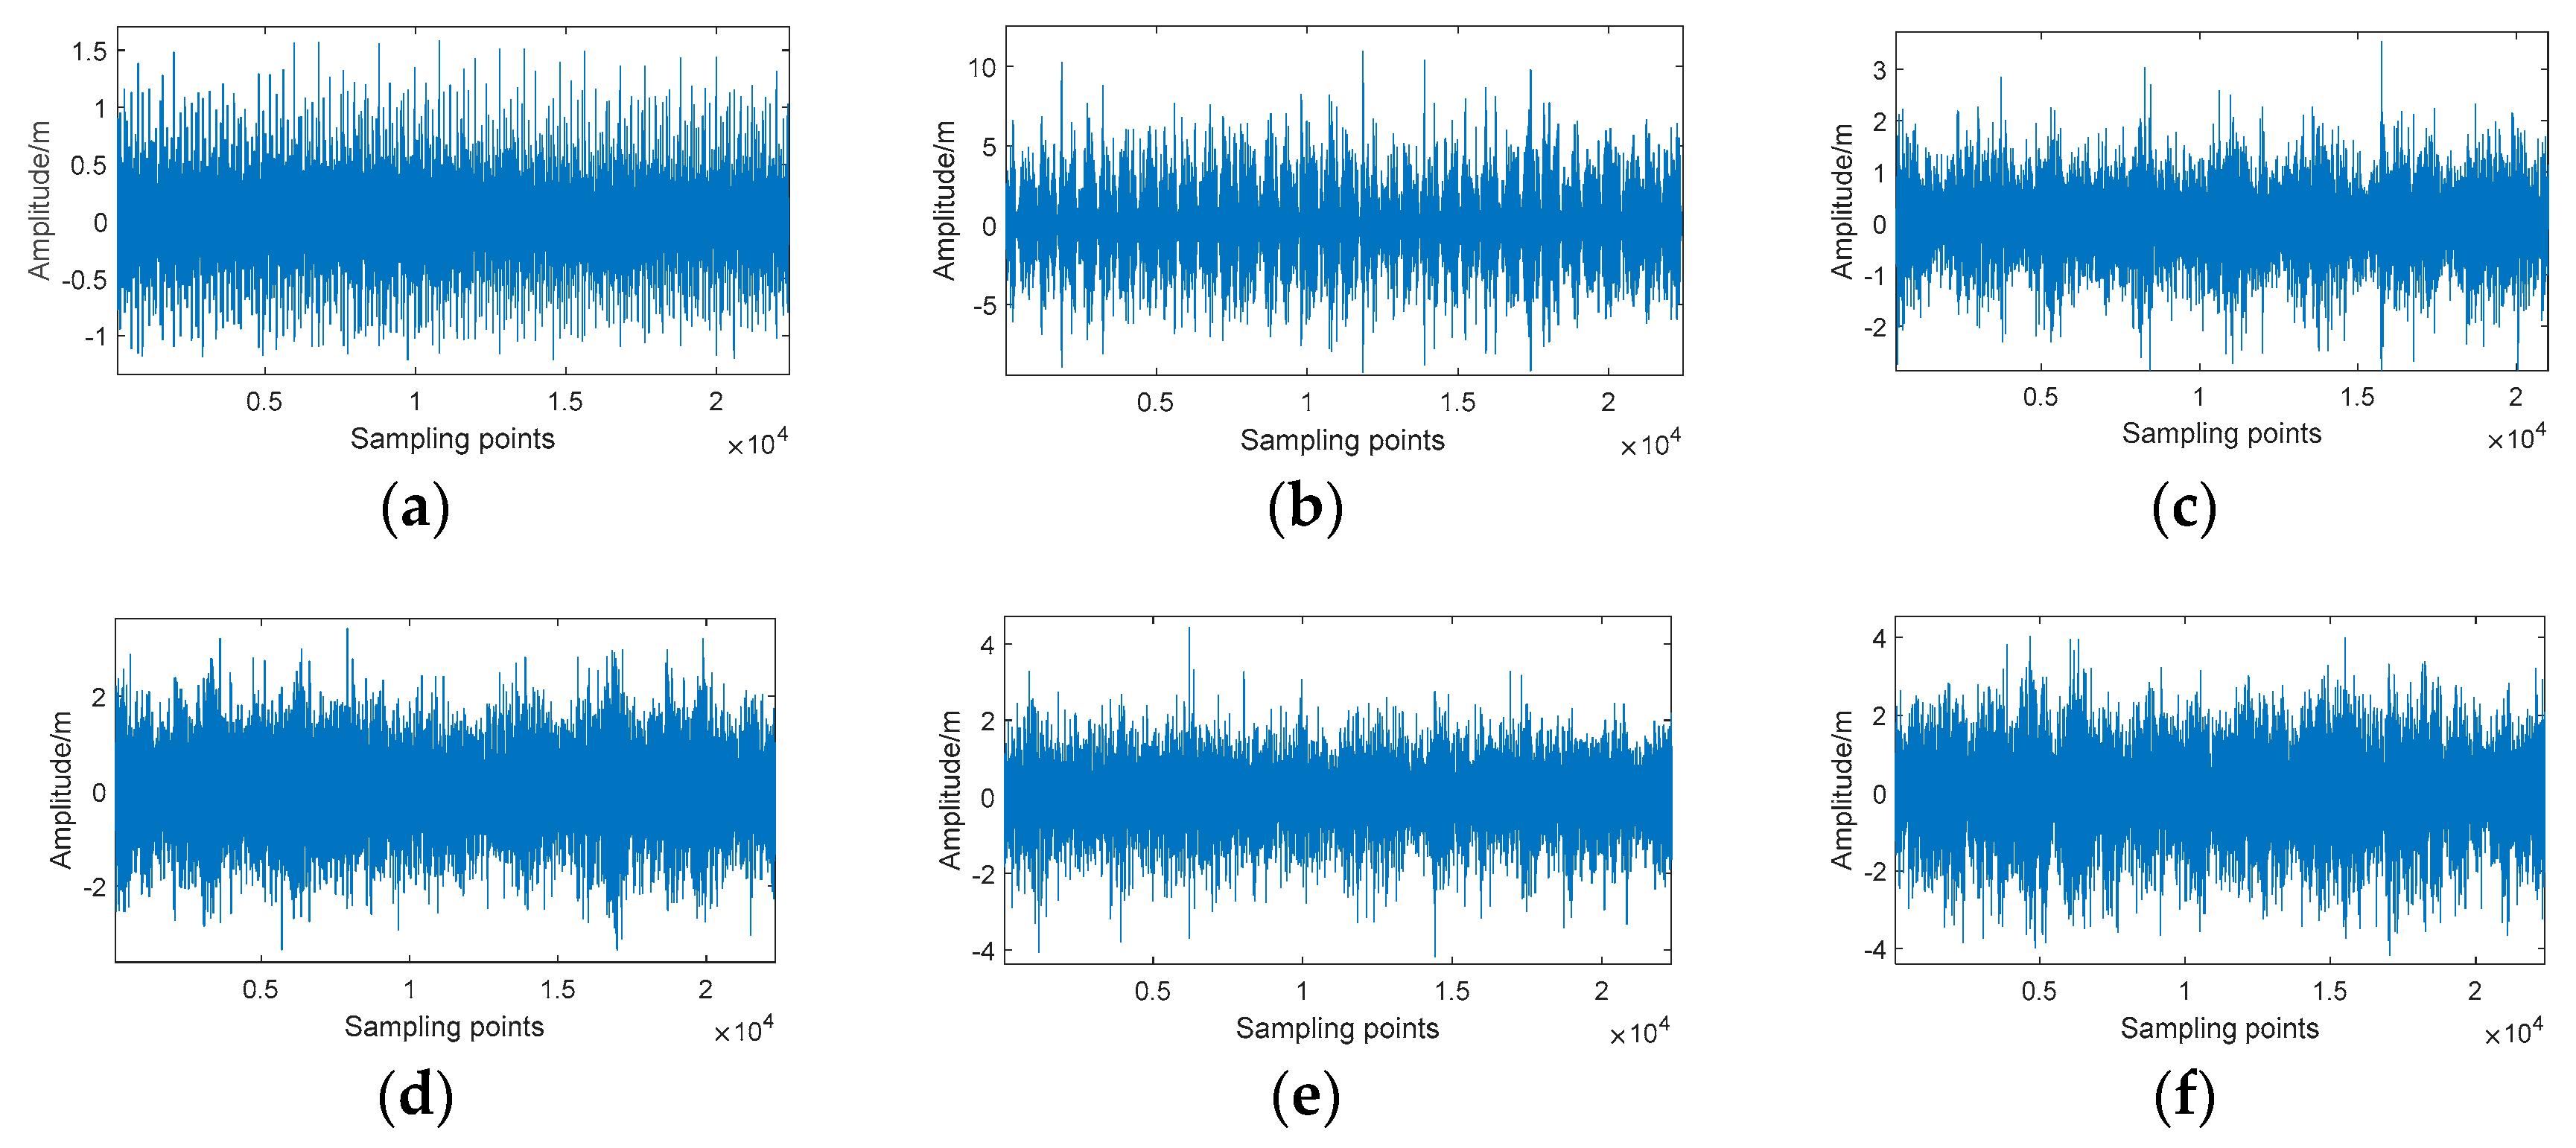 Electronics | Free Full-Text | Laplace Prior-Based Bayesian